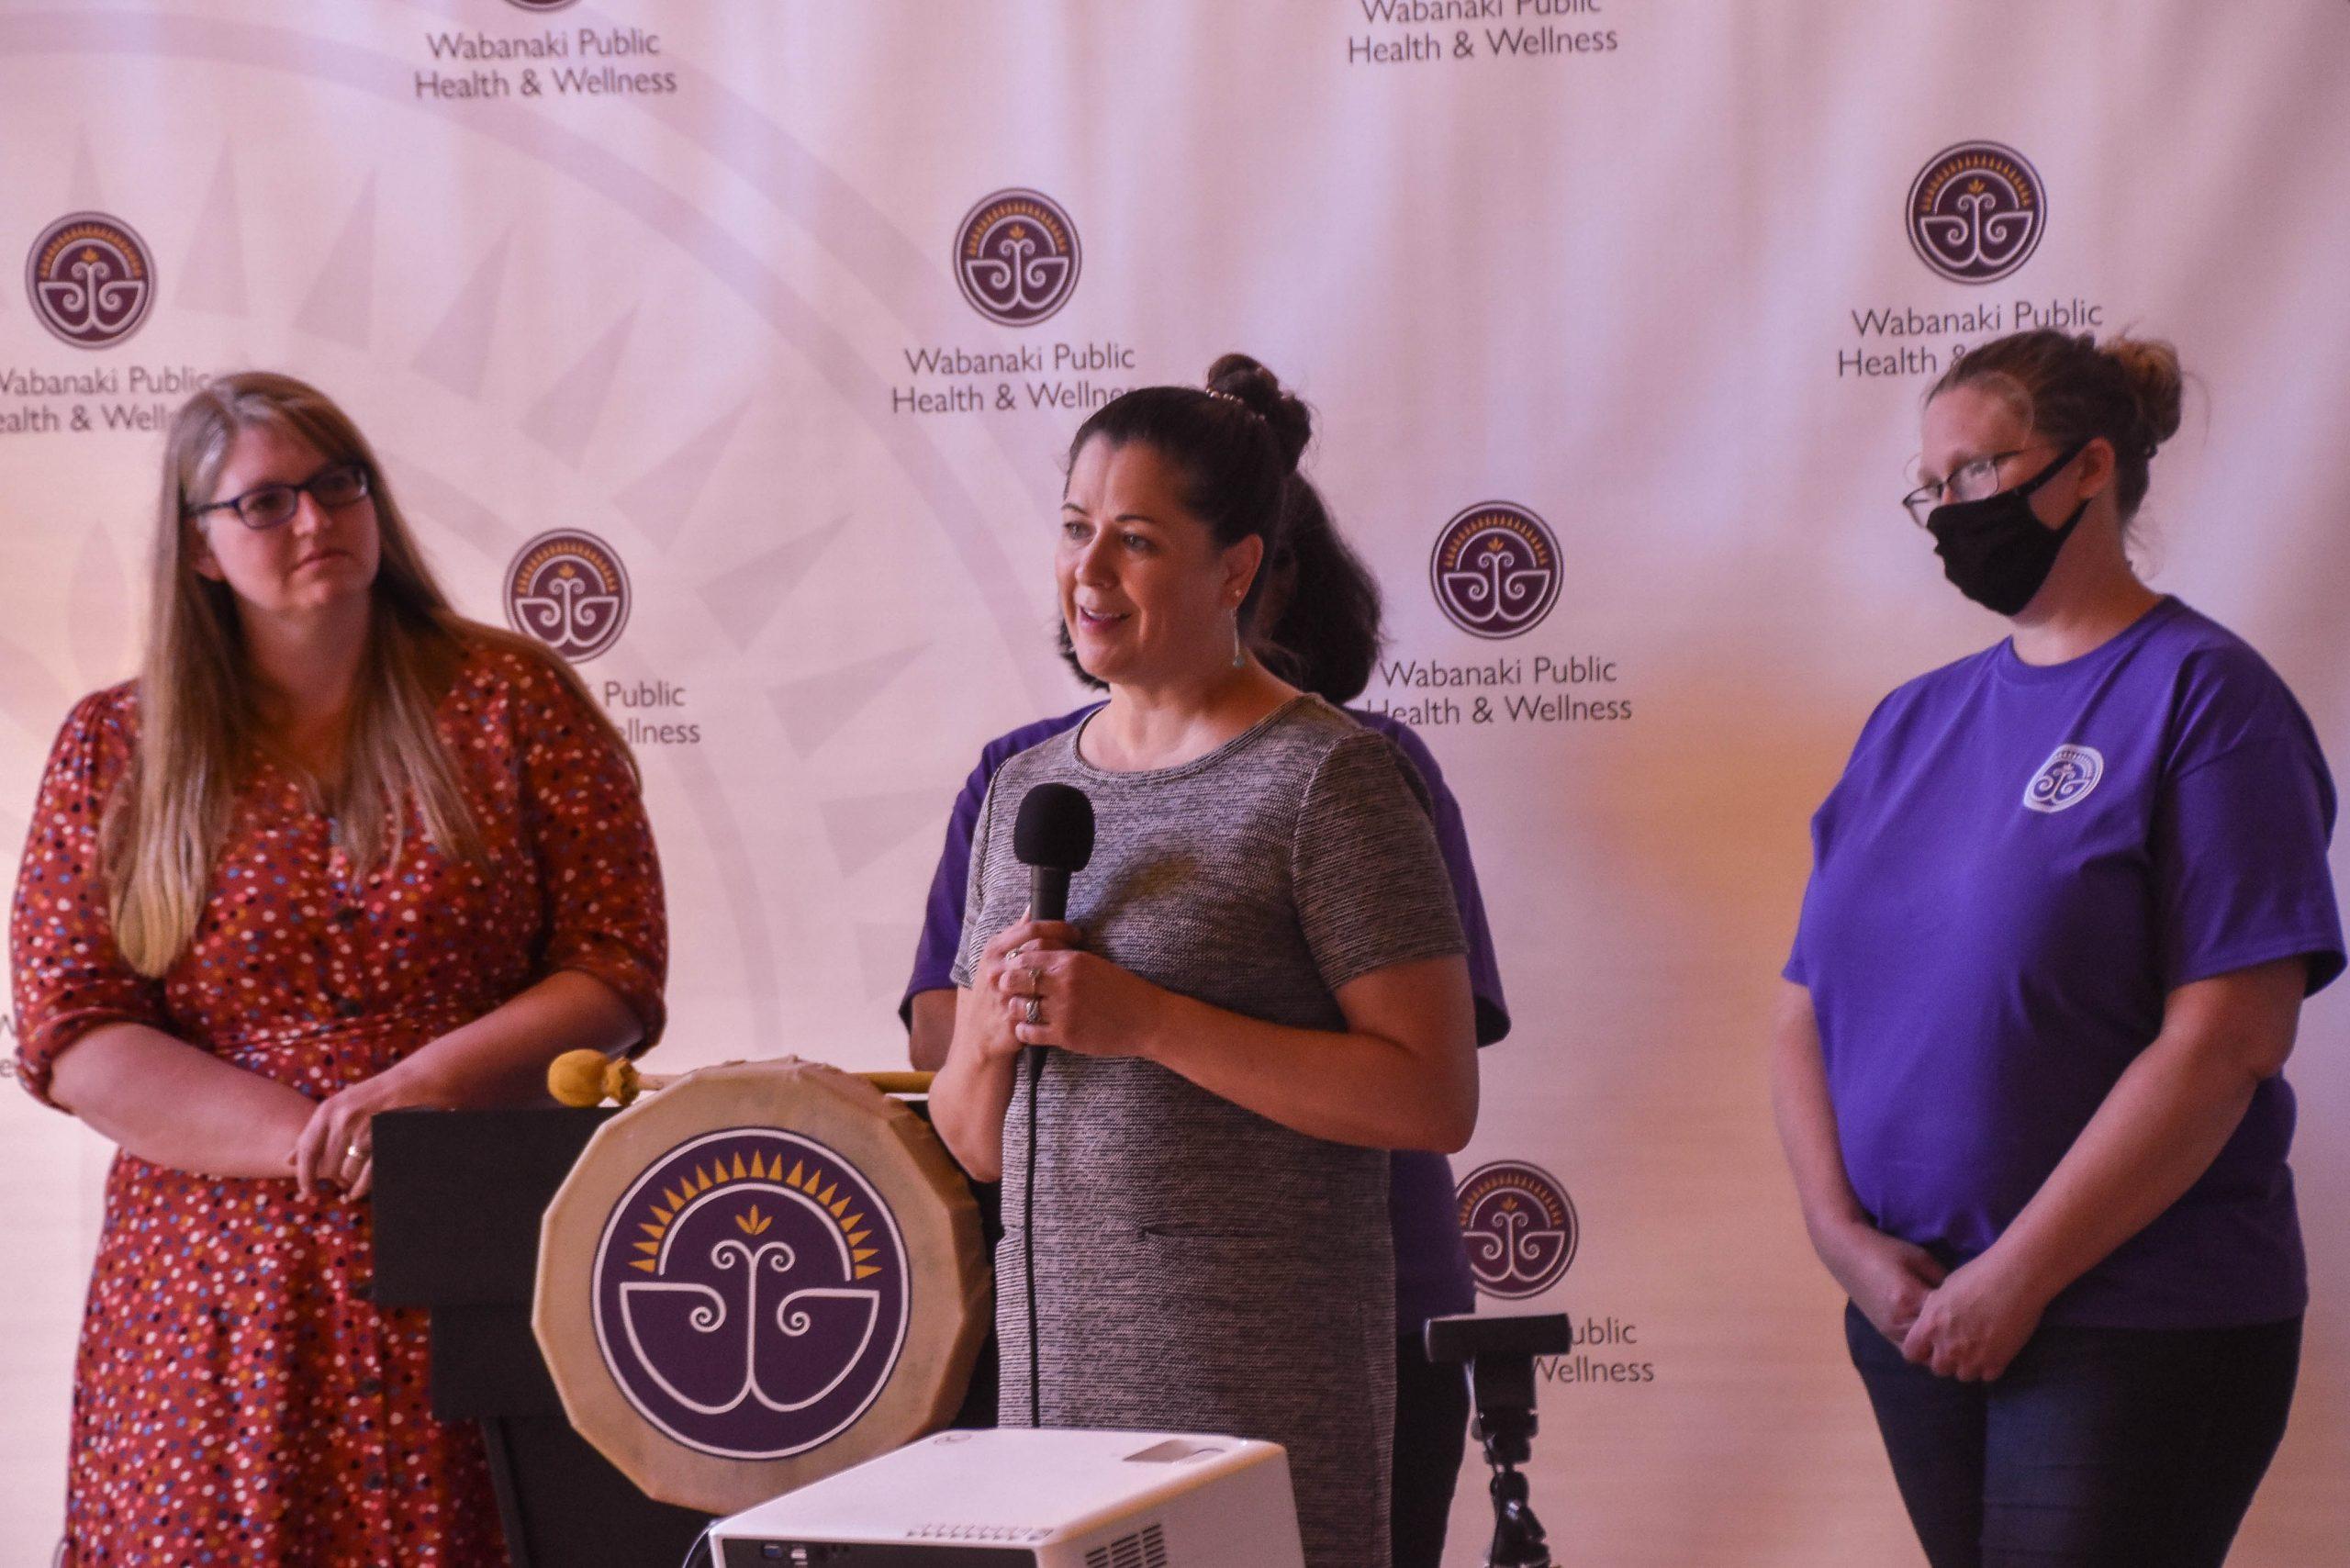 Wabanaki Public Health & Wellness hosts first Tribal Leaders Convening in Millinocket